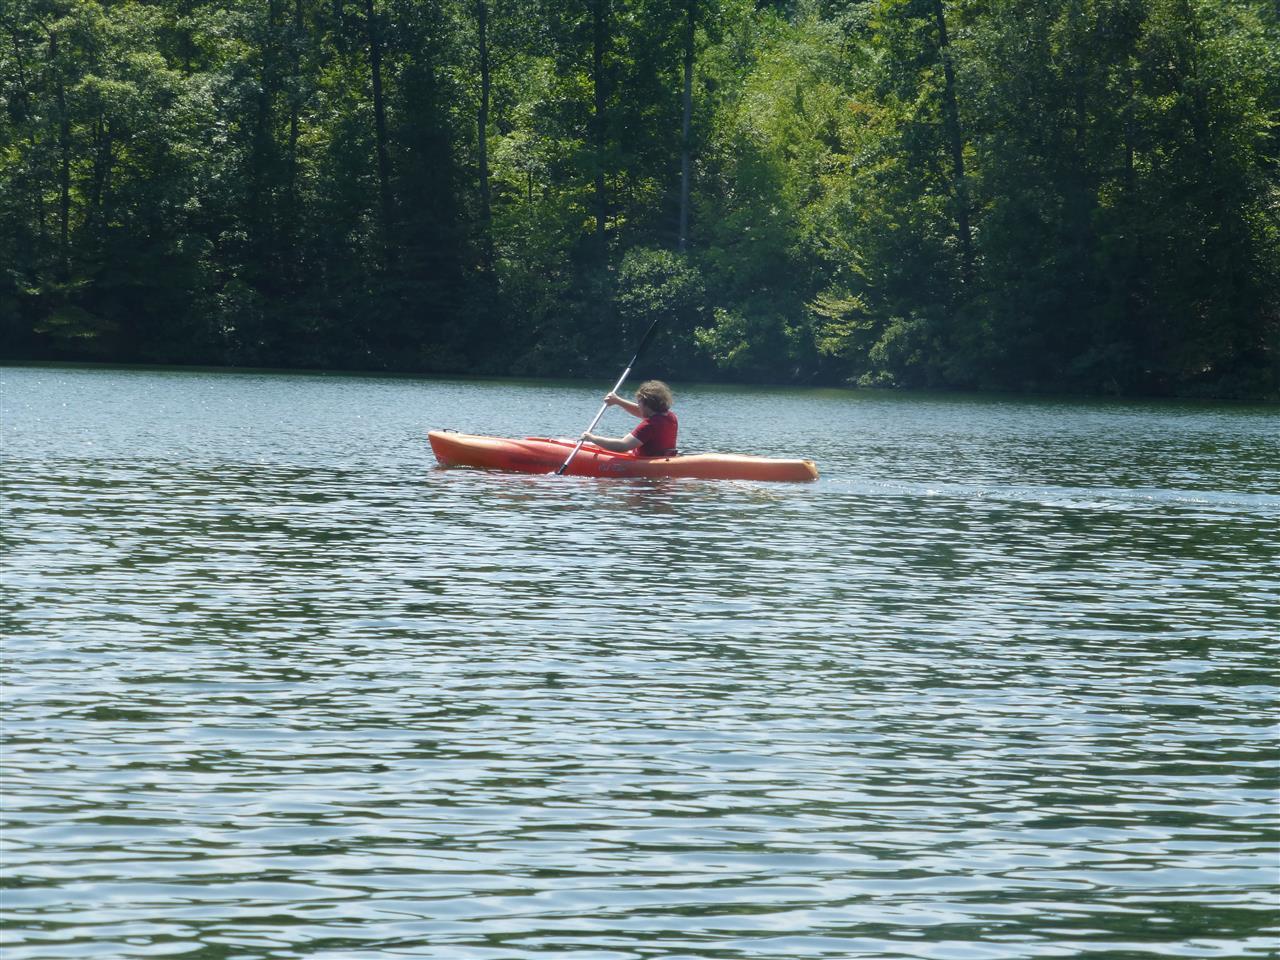 Kayaking on Waller's Mill Pond Williamsburg, VA